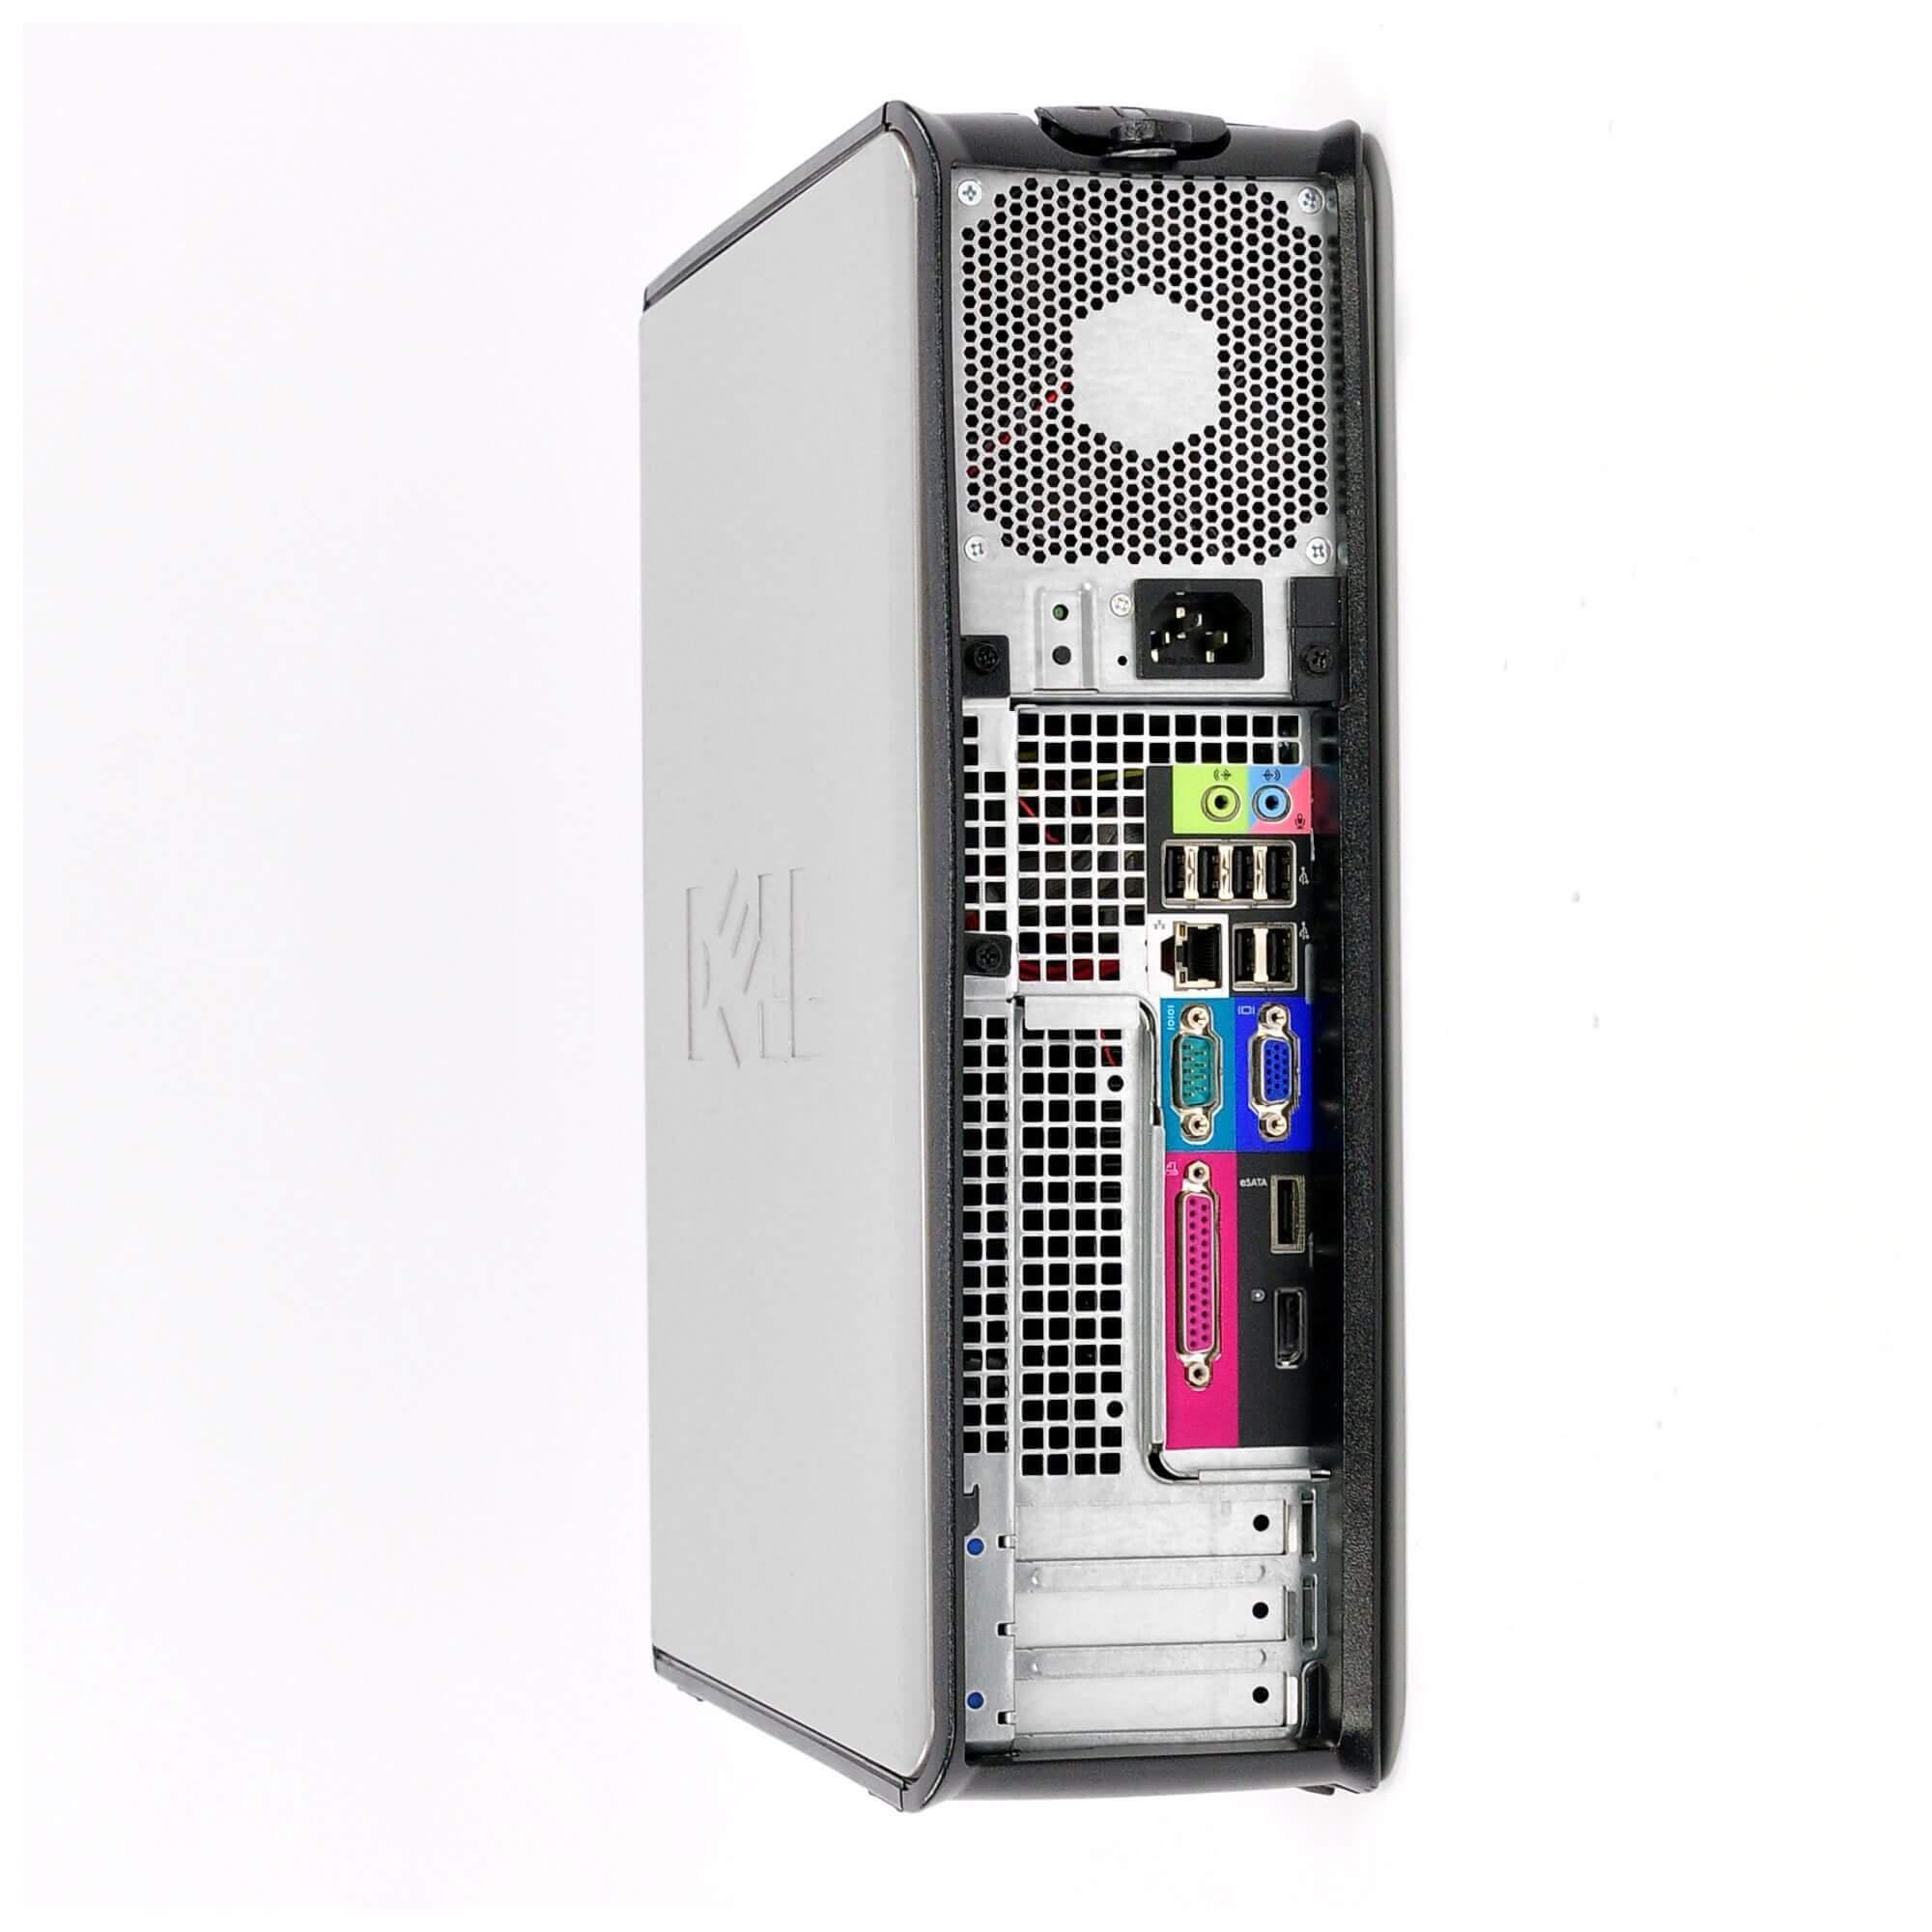 Dell OptiPlex 780 SFF Pentium 3,2 GHz - HDD 250 Go RAM 6 Go